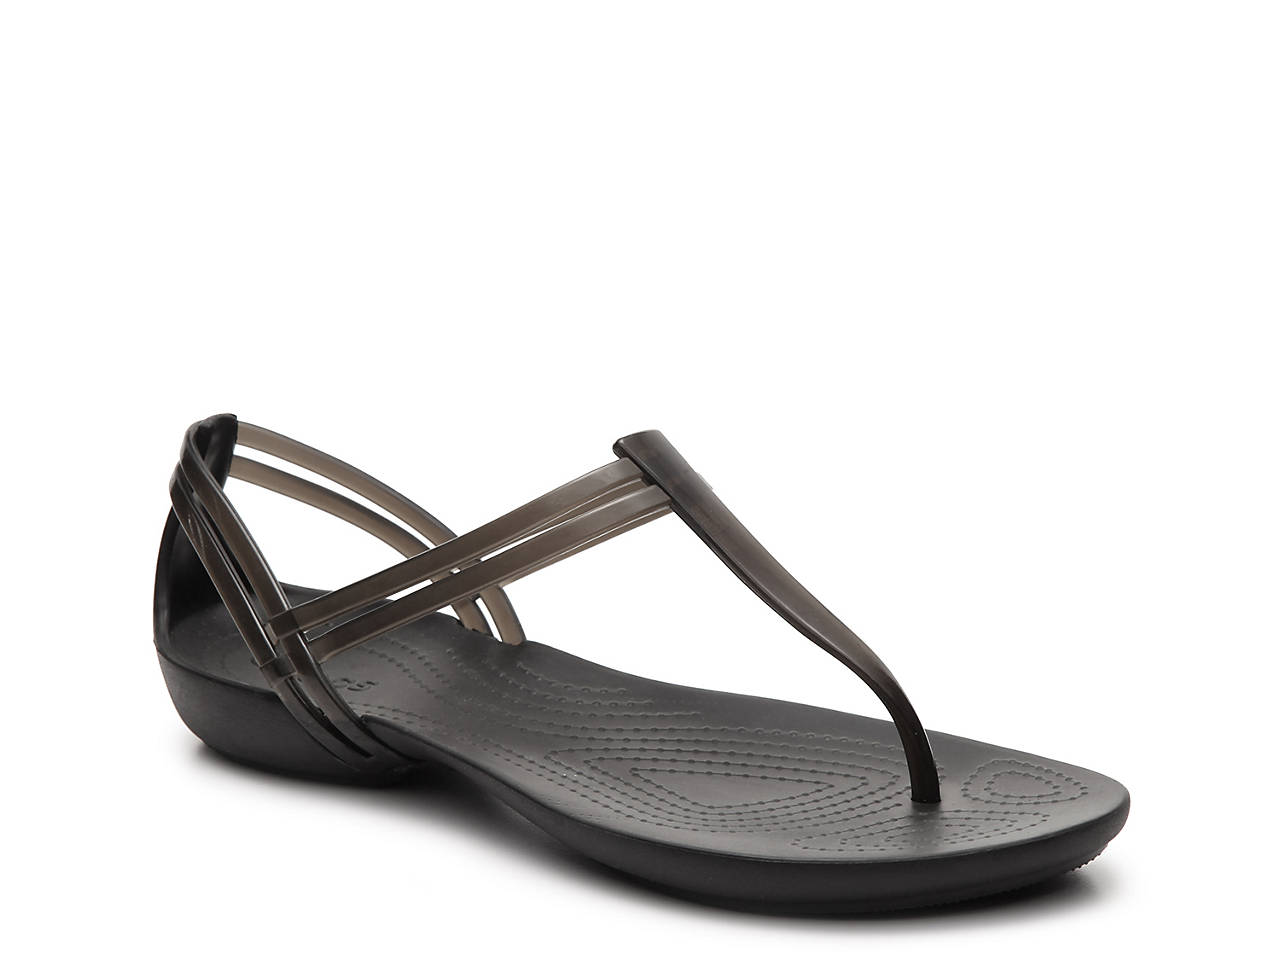 b16021b7f Crocs Isabella T-Strap Jelly Sandal Women s Shoes